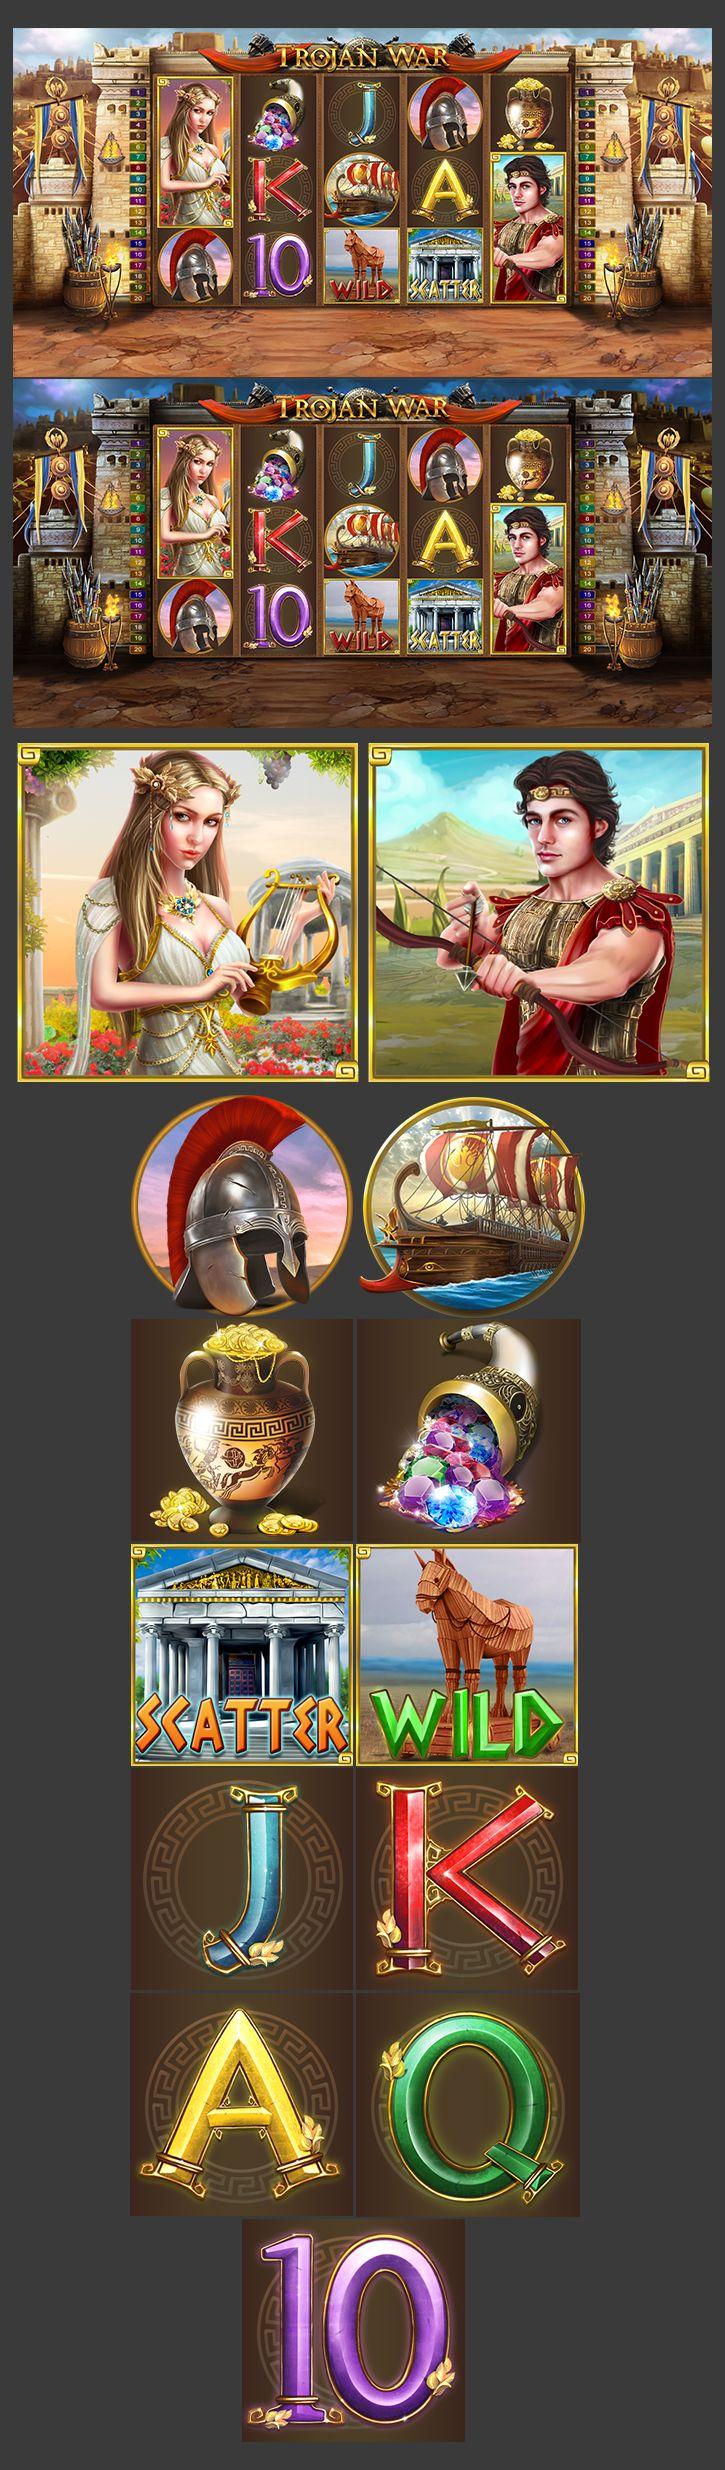 Slot Machine Trojan War Casino on Behance